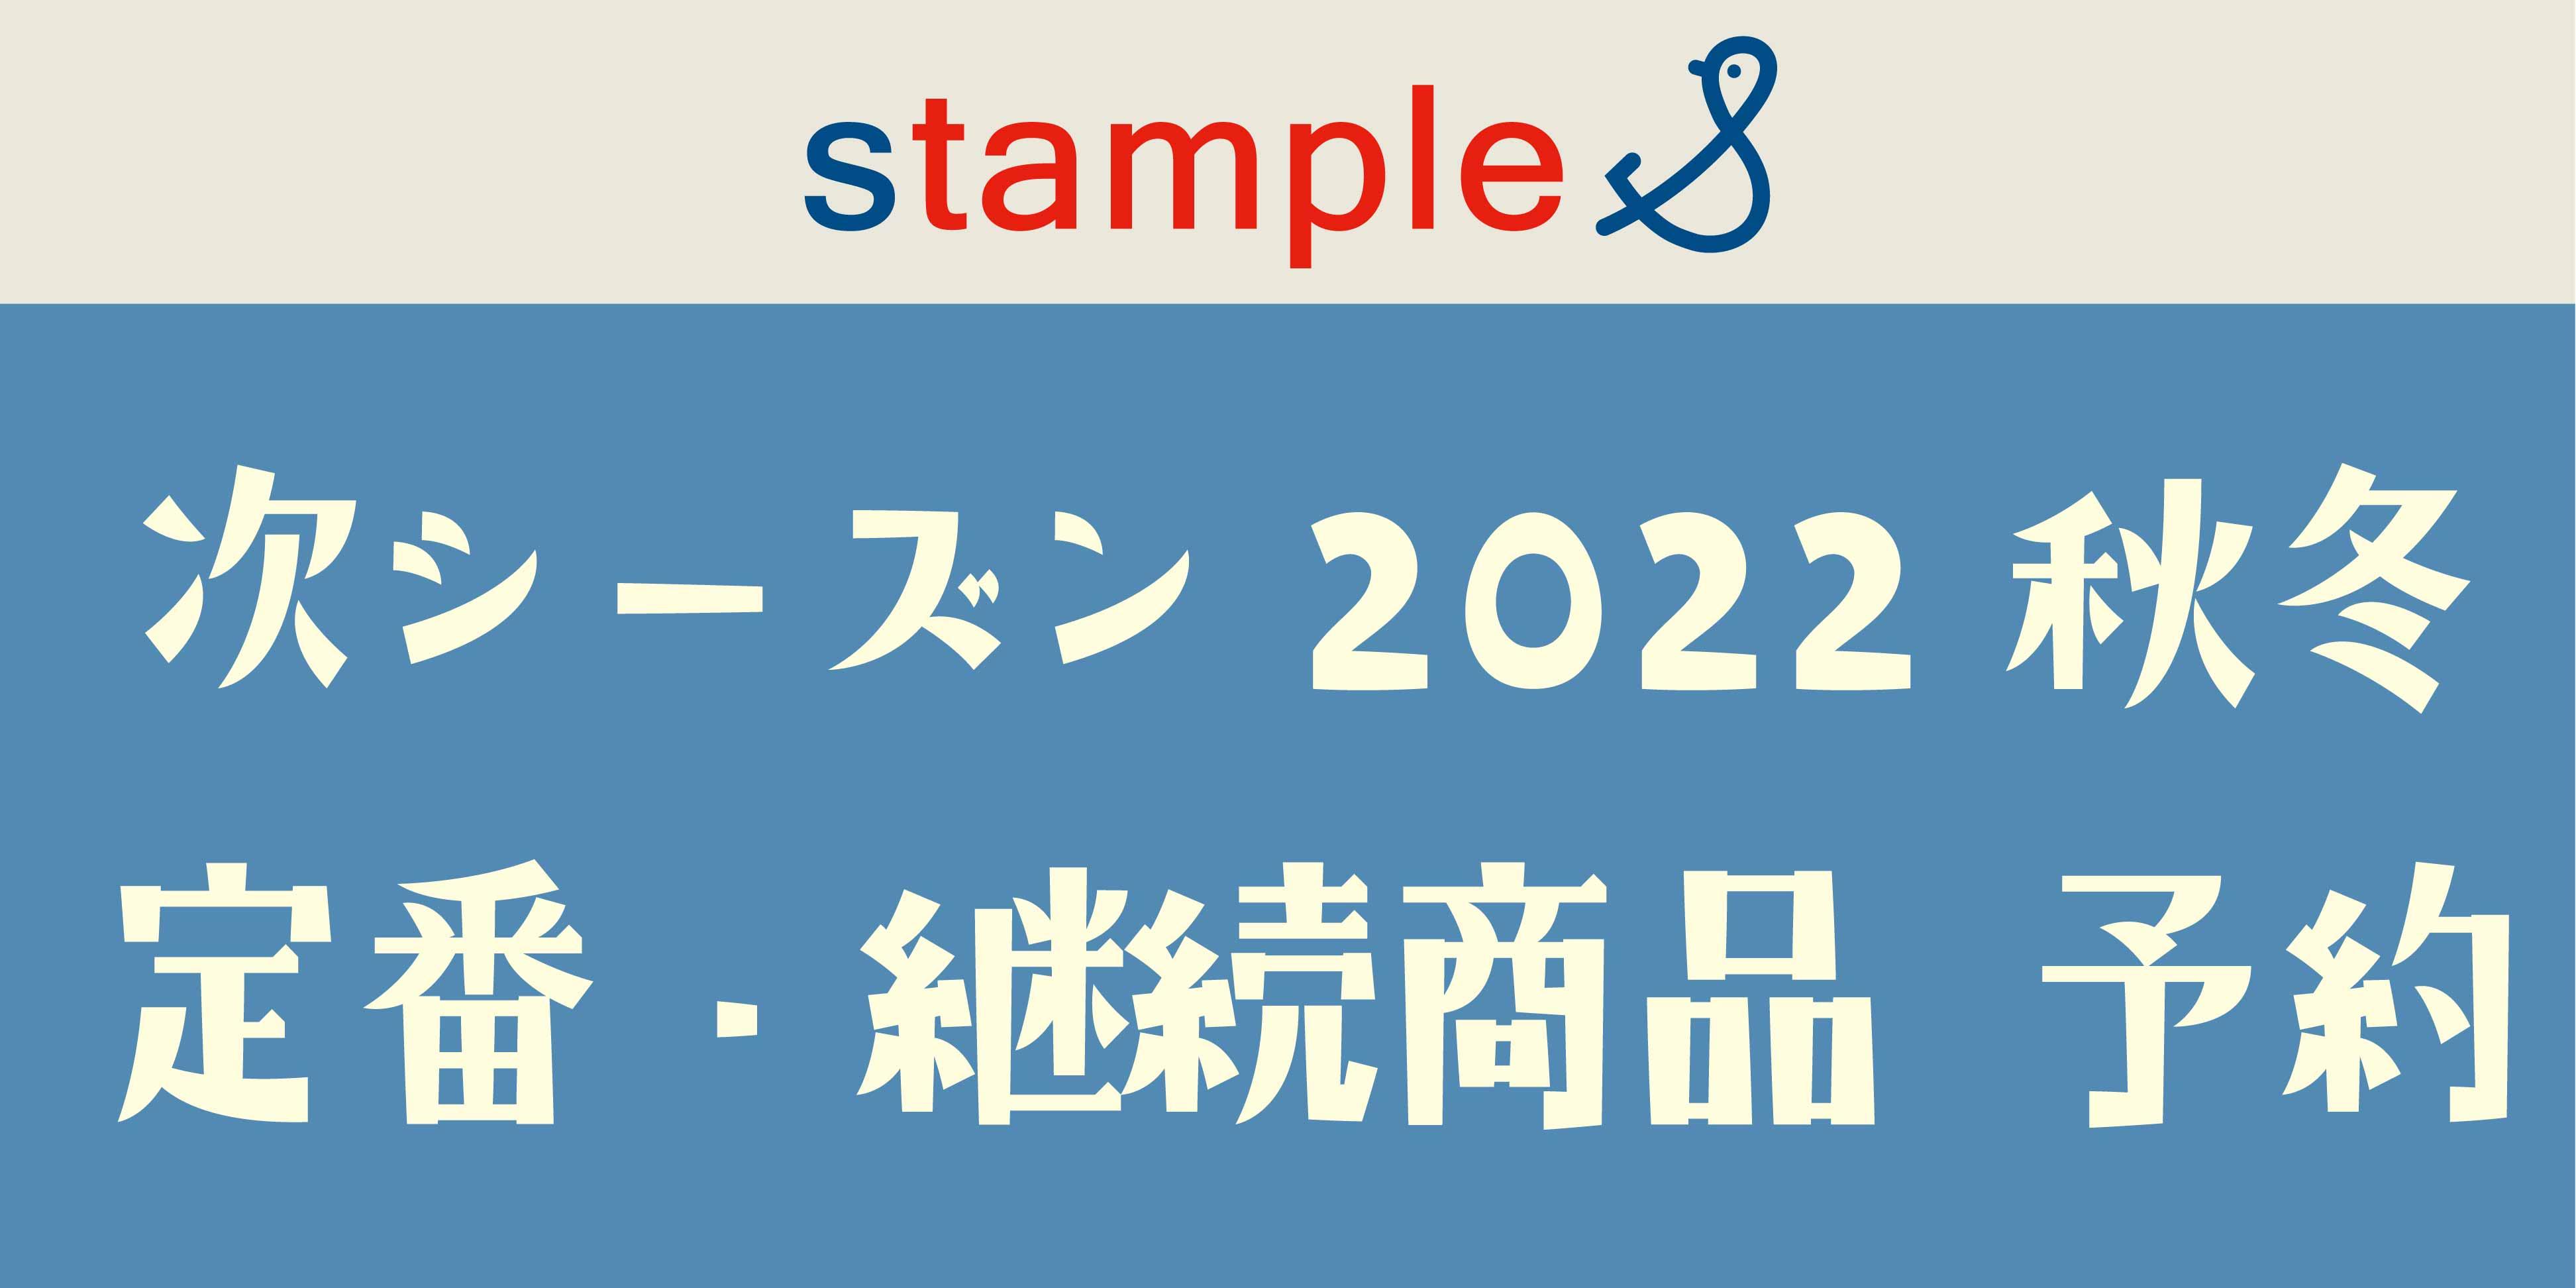 stample:2021秋冬 定番・継続商品 予約